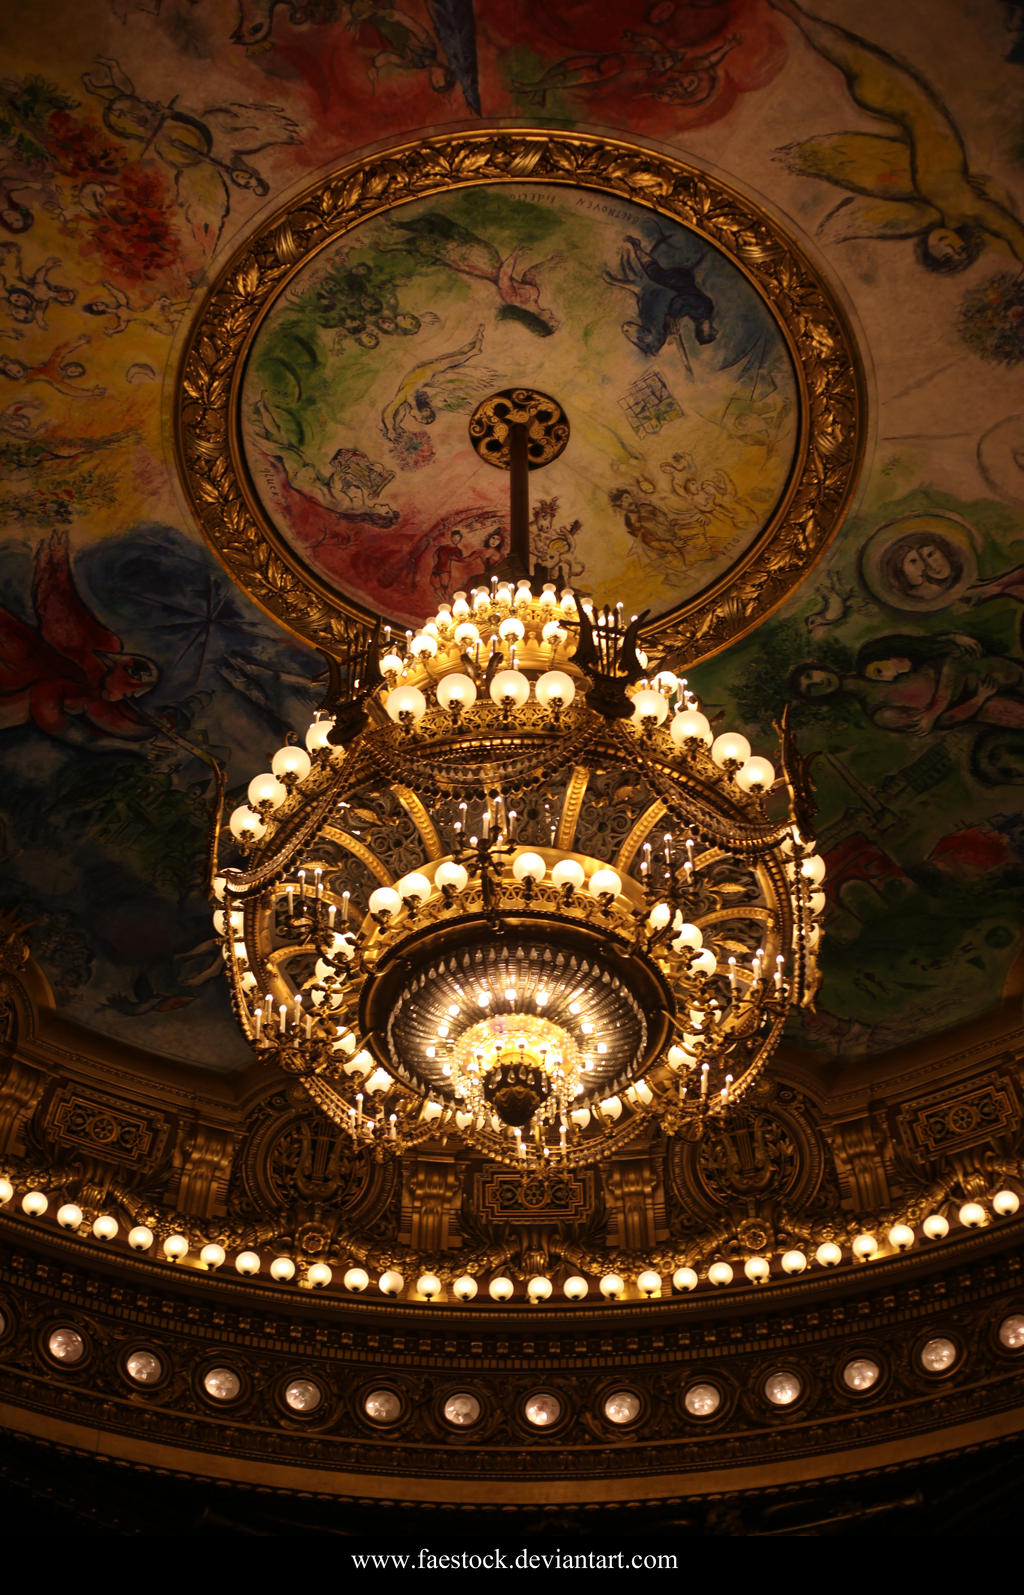 Paris Opera House12 by faestock